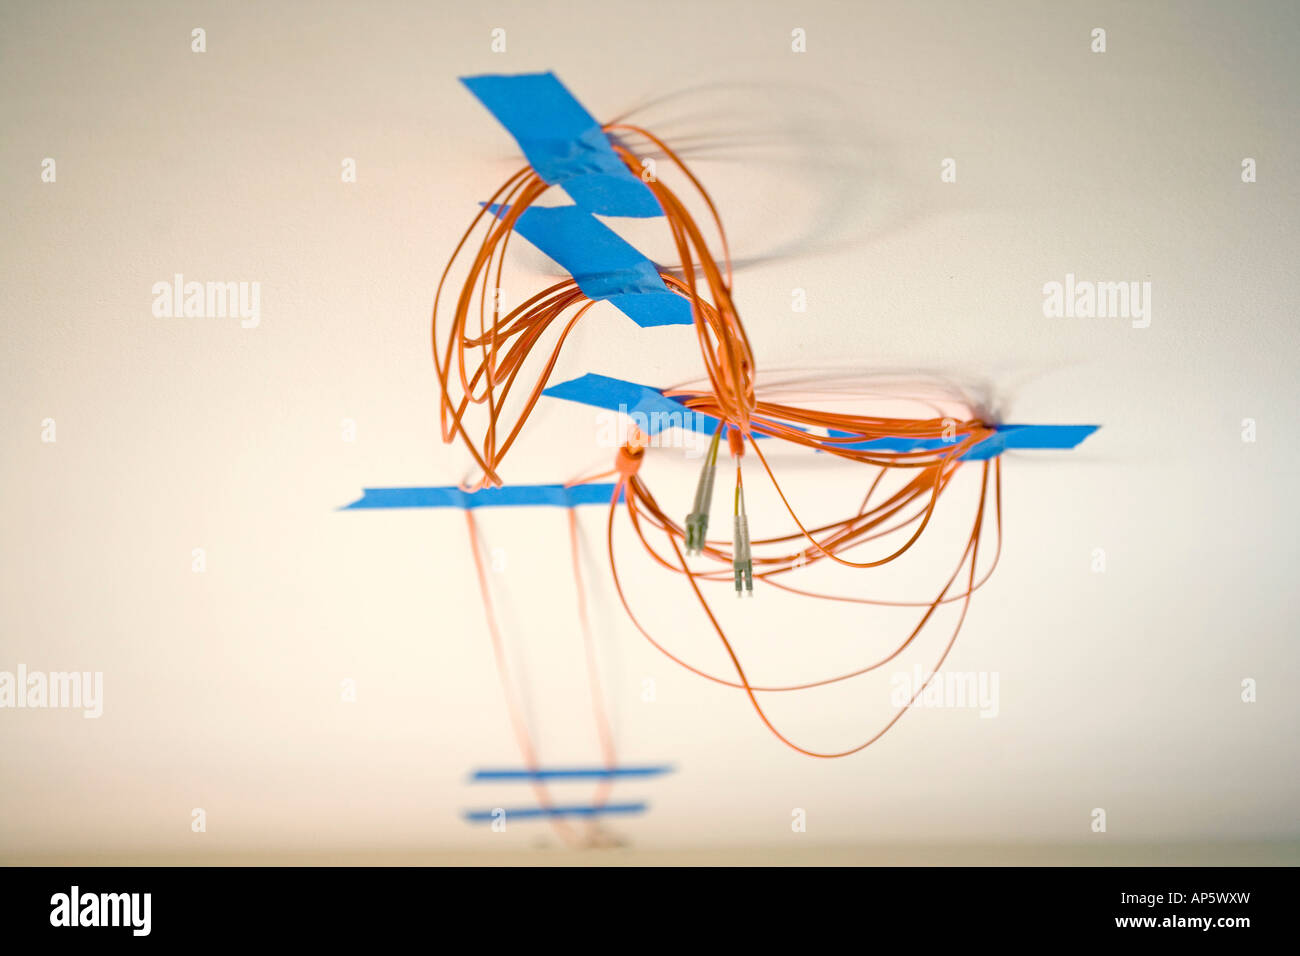 Cable de fibra óptica internet abstracto naranja azul diseño en blanco. Imagen De Stock